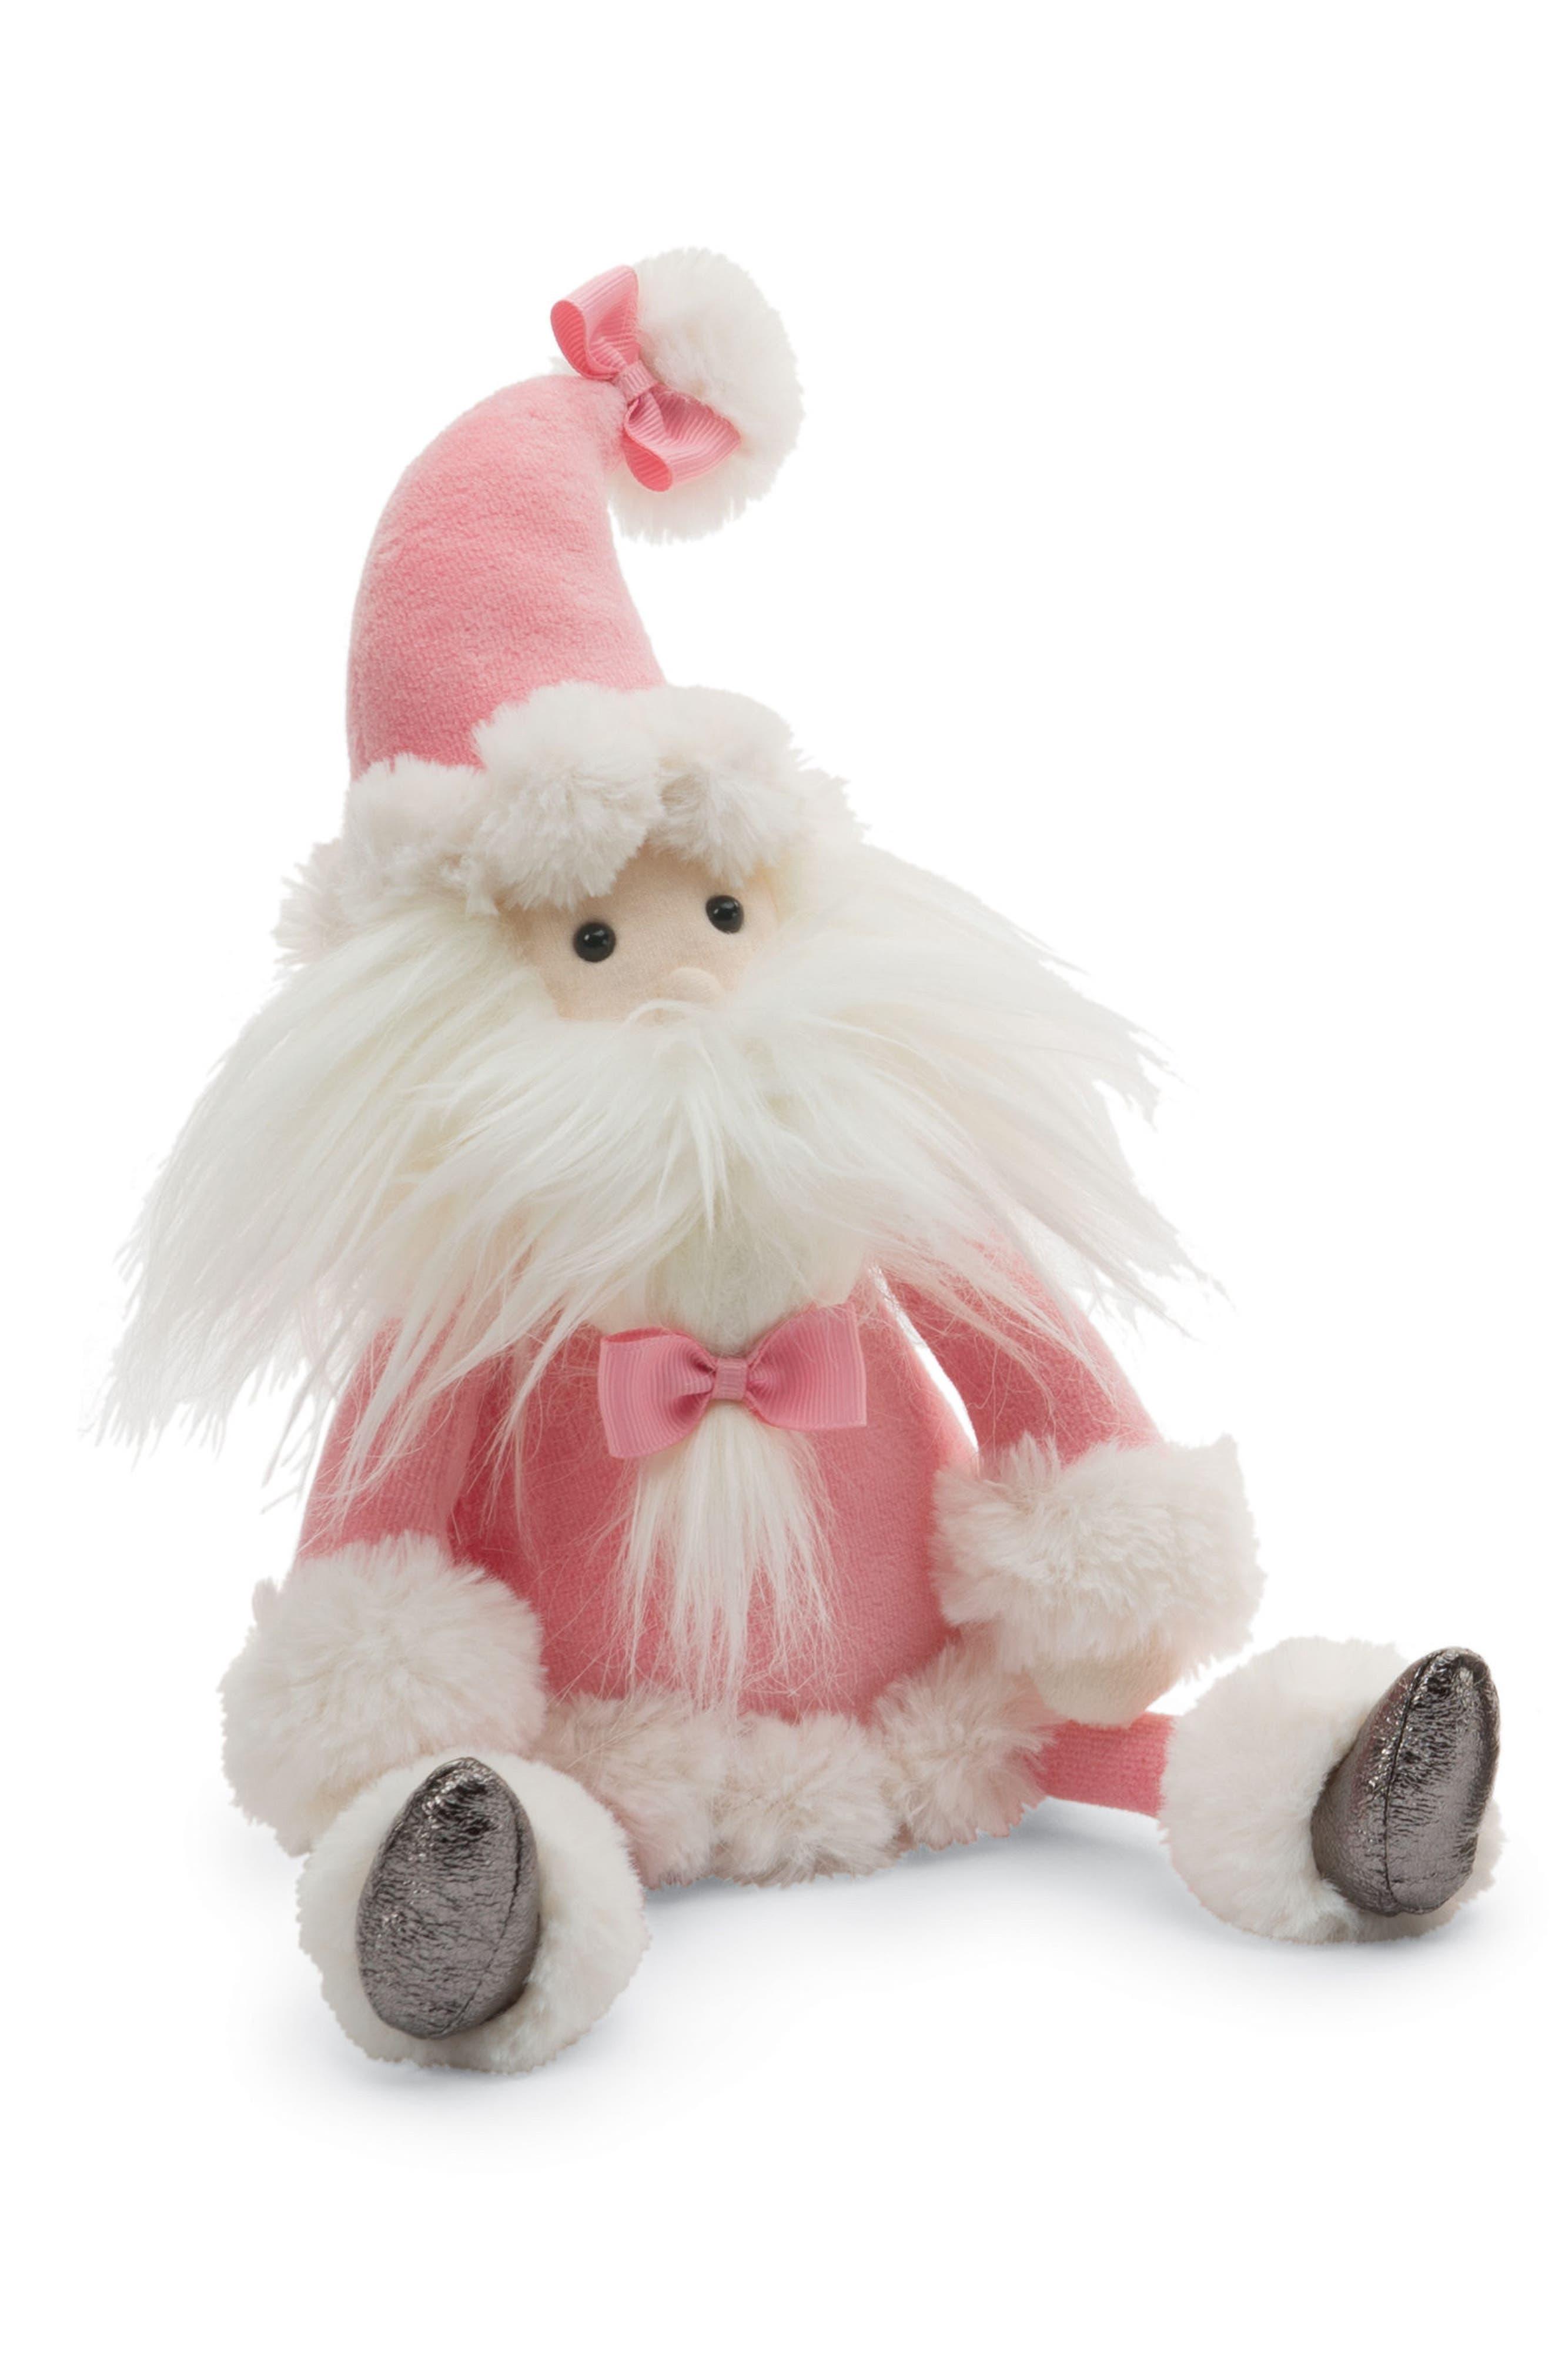 Medium Splendid Santa Stuffed Doll,                             Alternate thumbnail 3, color,                             680